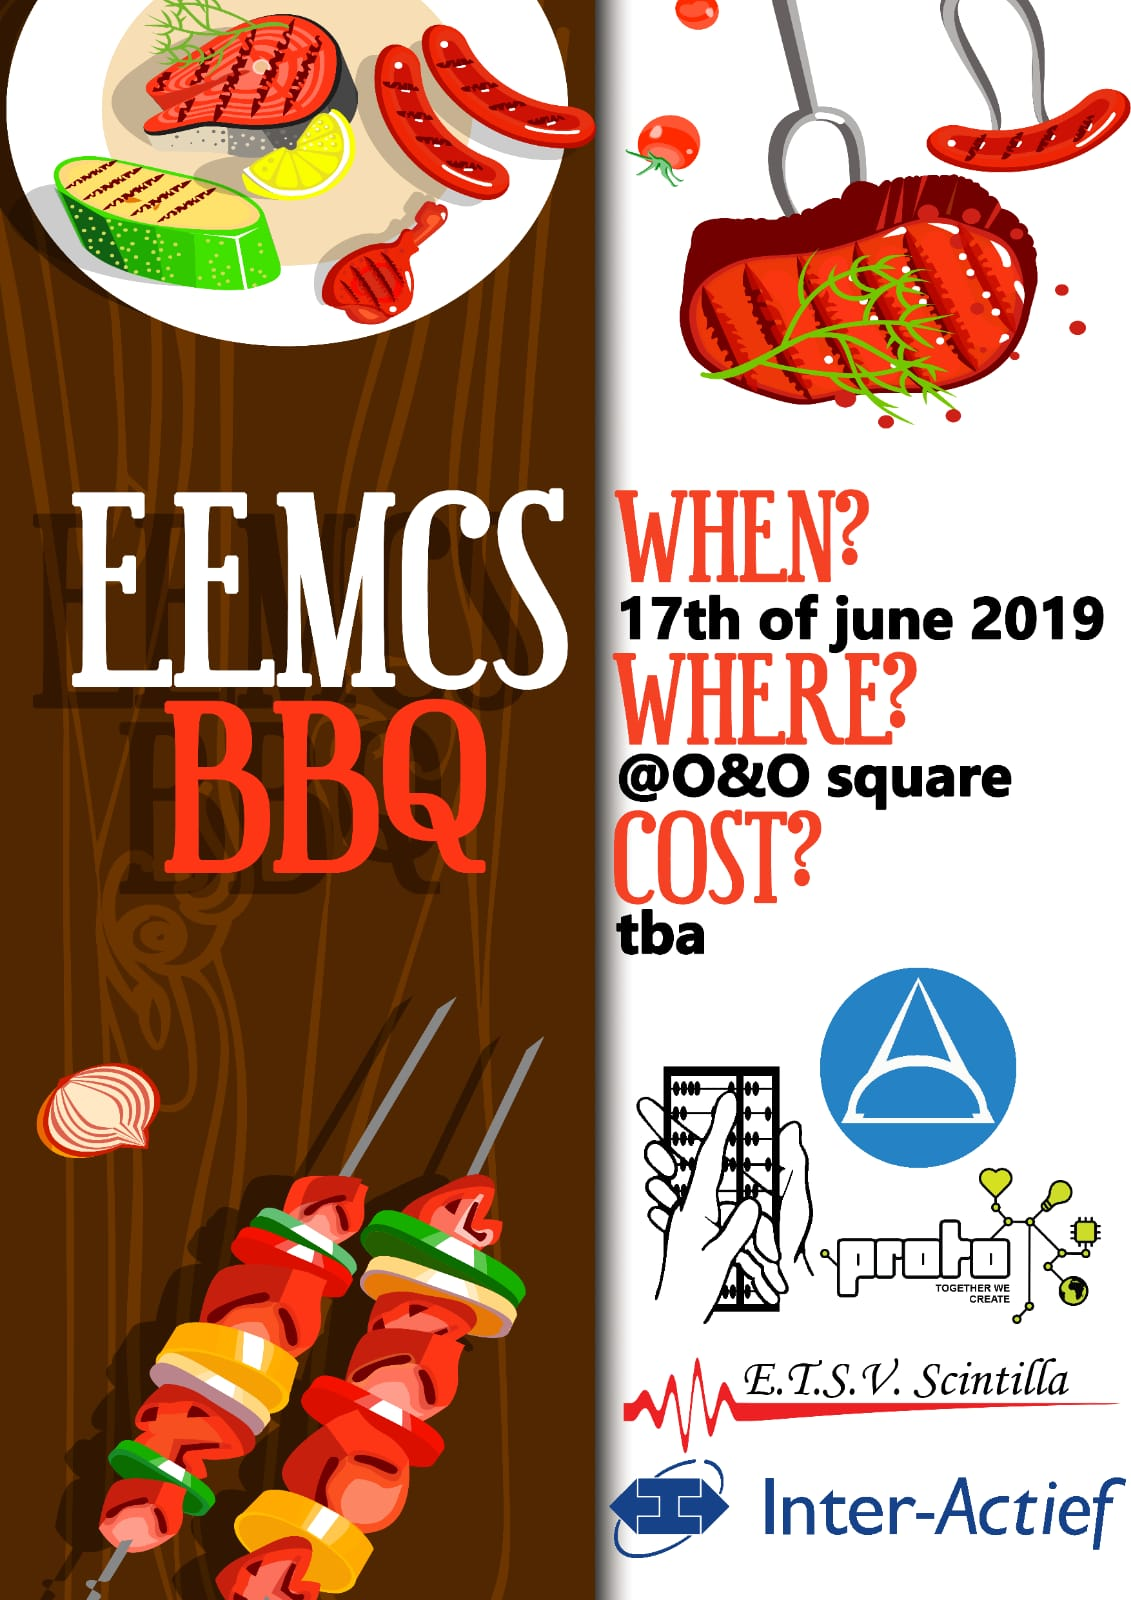 EEMCS Barbecue